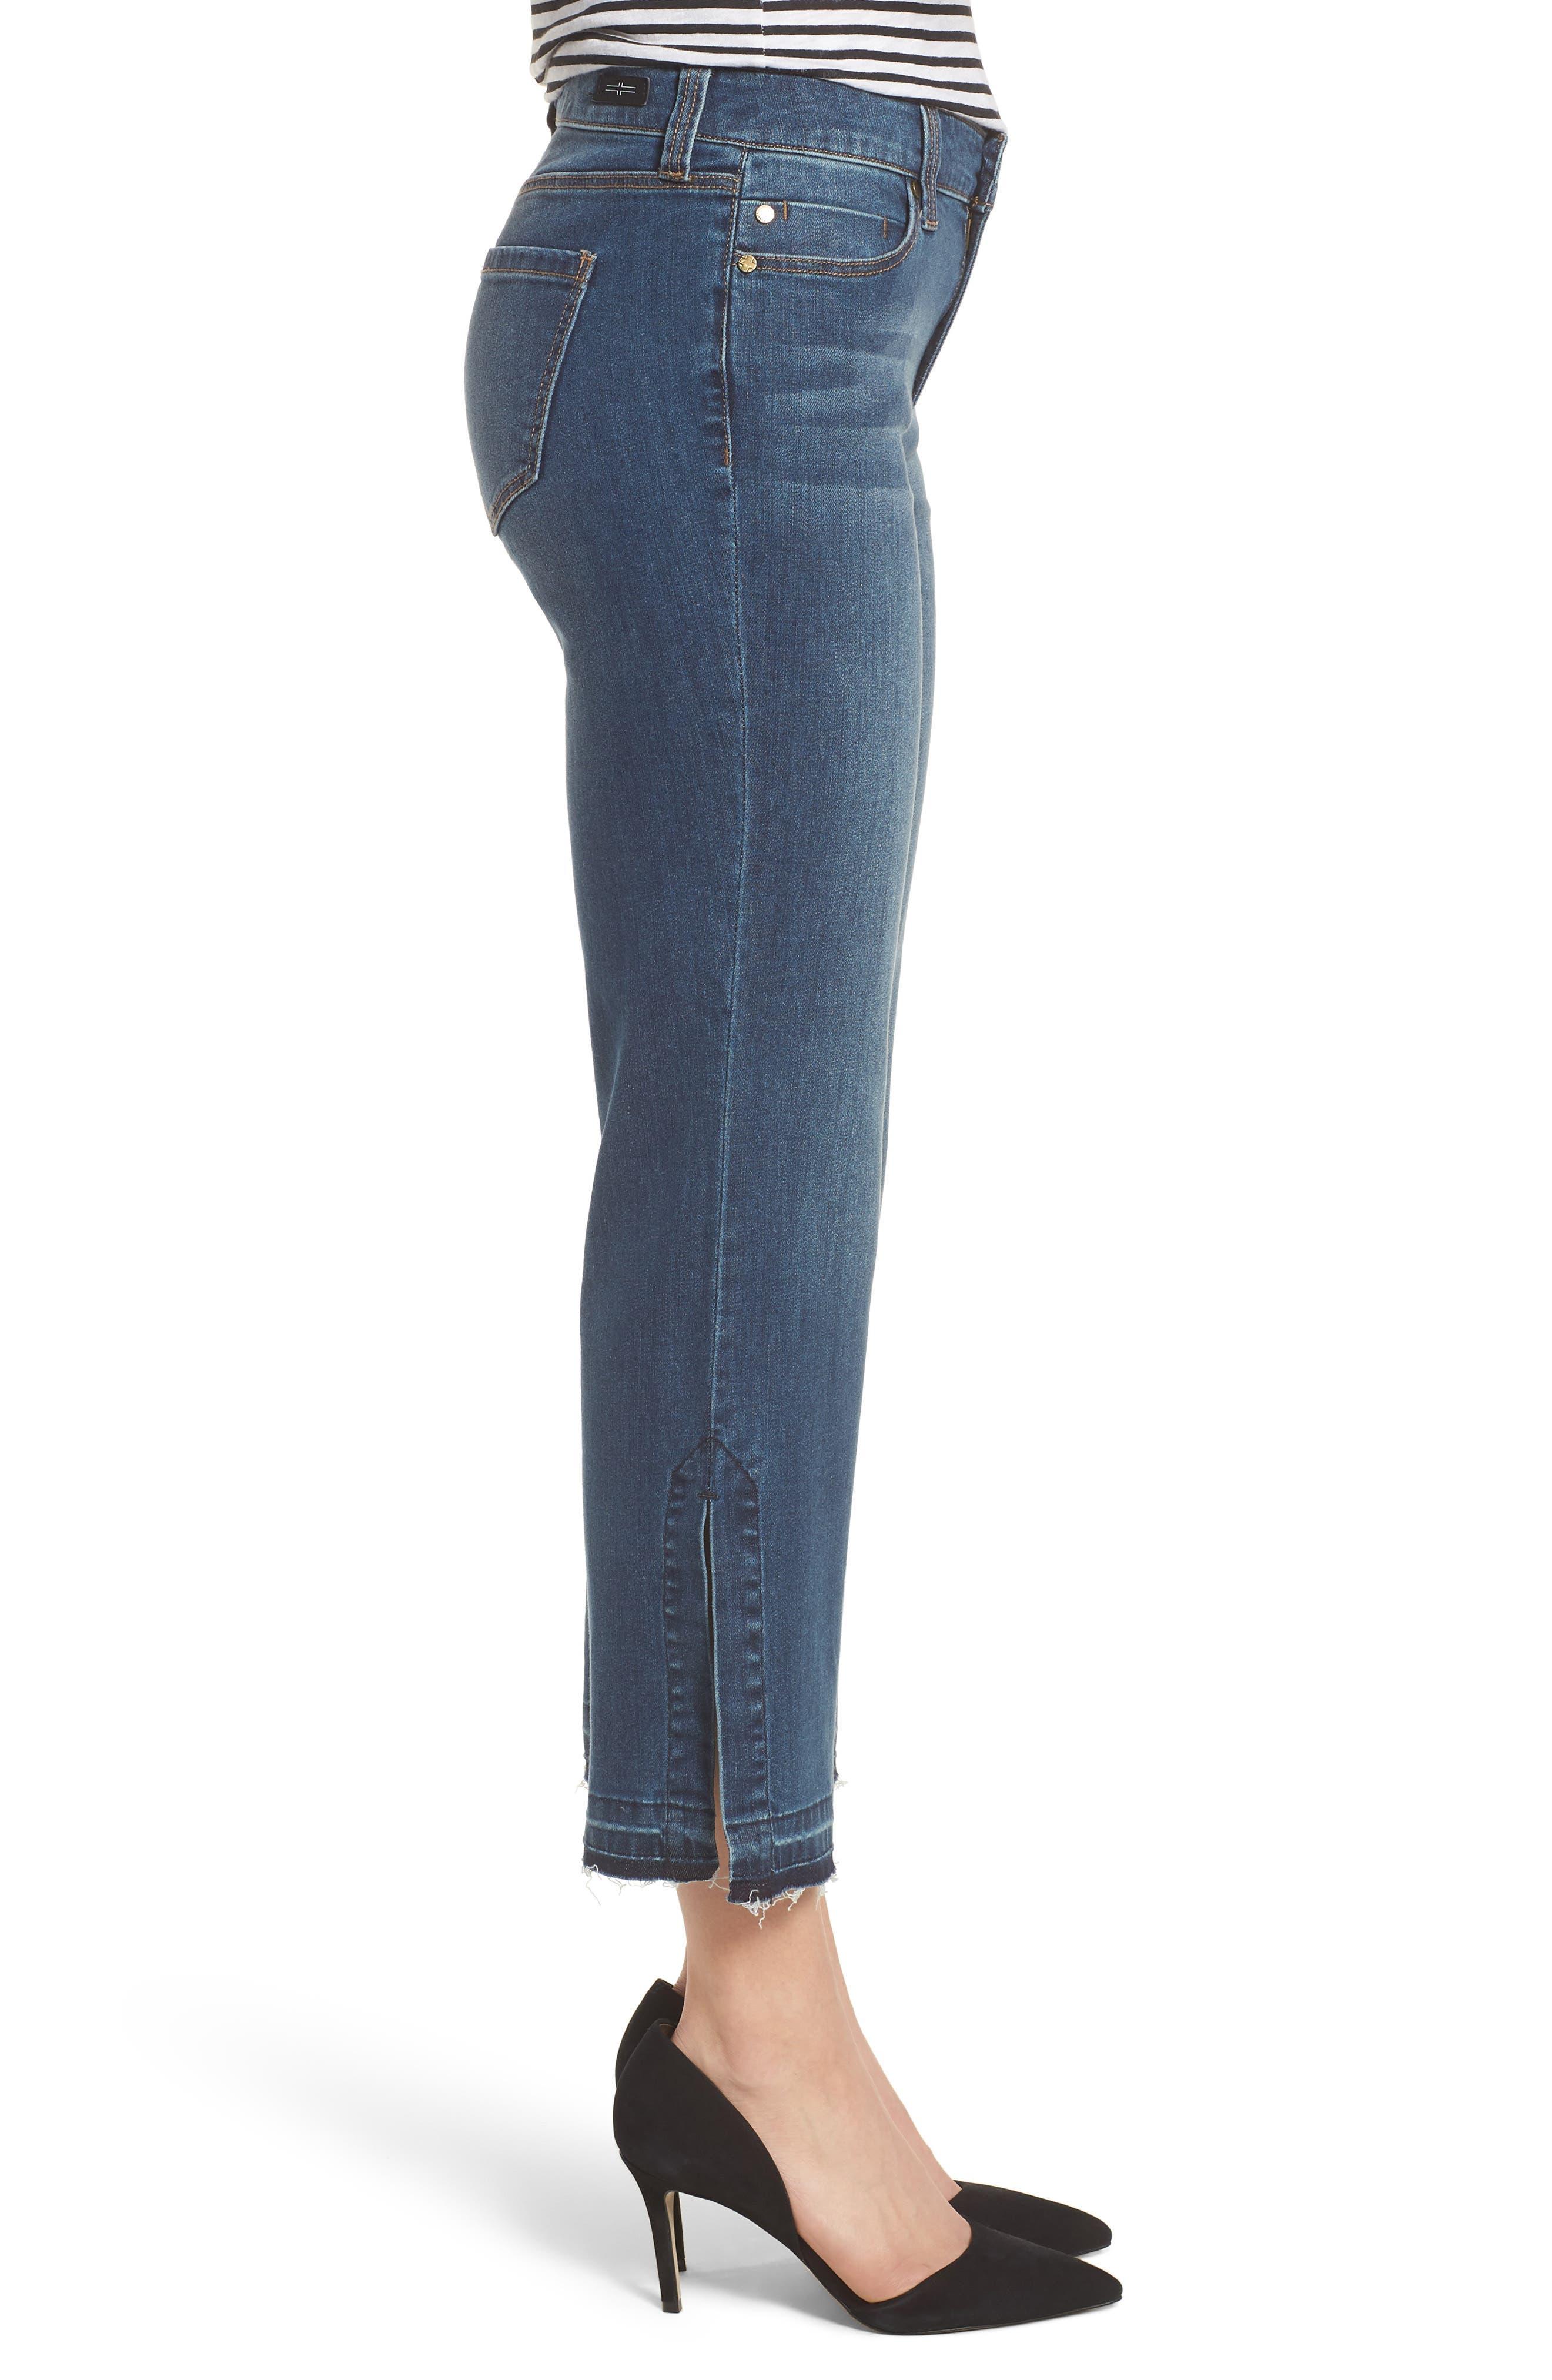 Tabitha Release Hem Crop Jeans,                             Alternate thumbnail 3, color,                             403